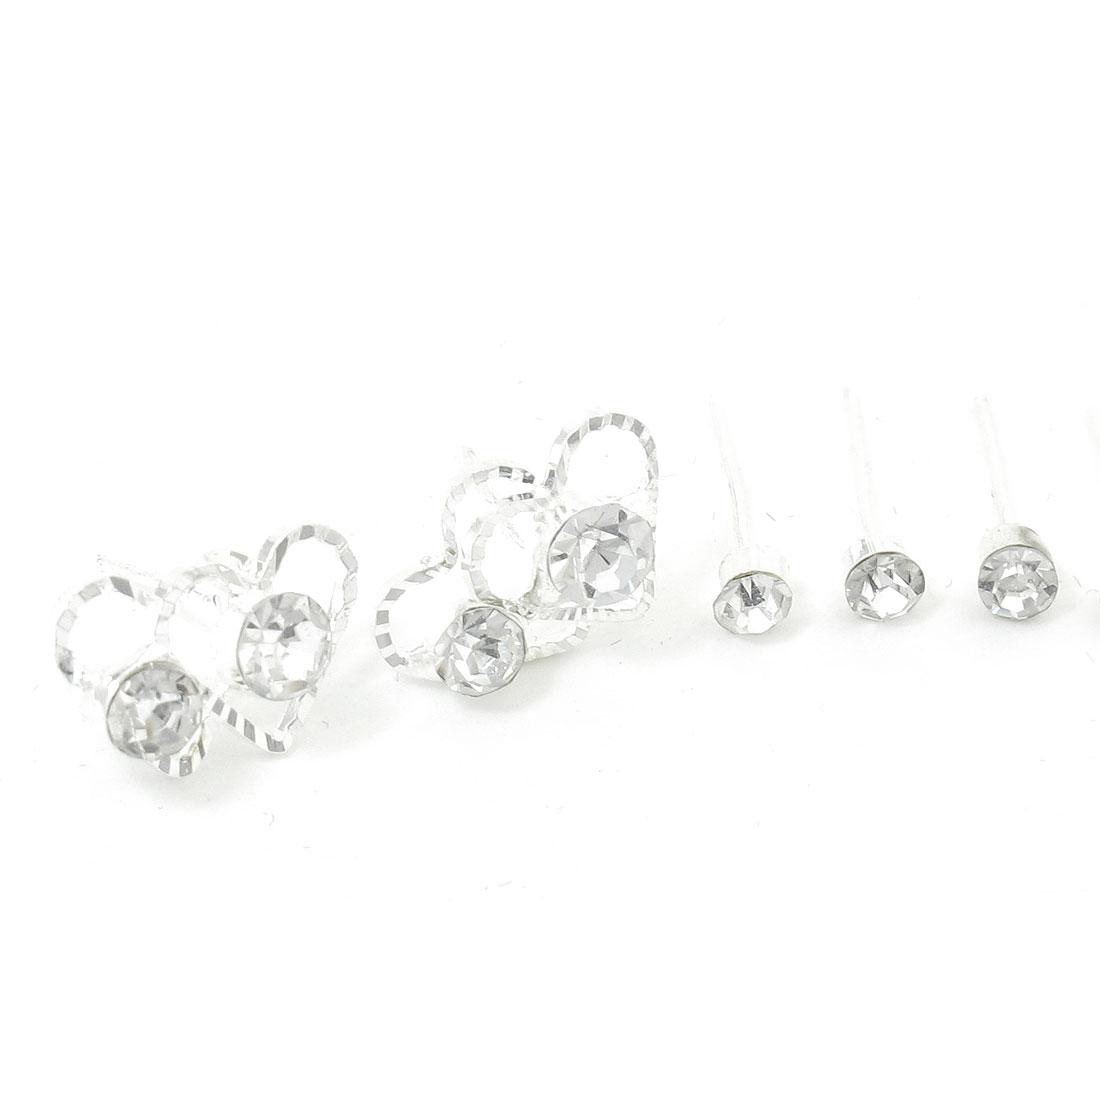 Lady Heart Shape Shiny Rhinestones Decor Stud Earrings Silver Tone 3 Pairs